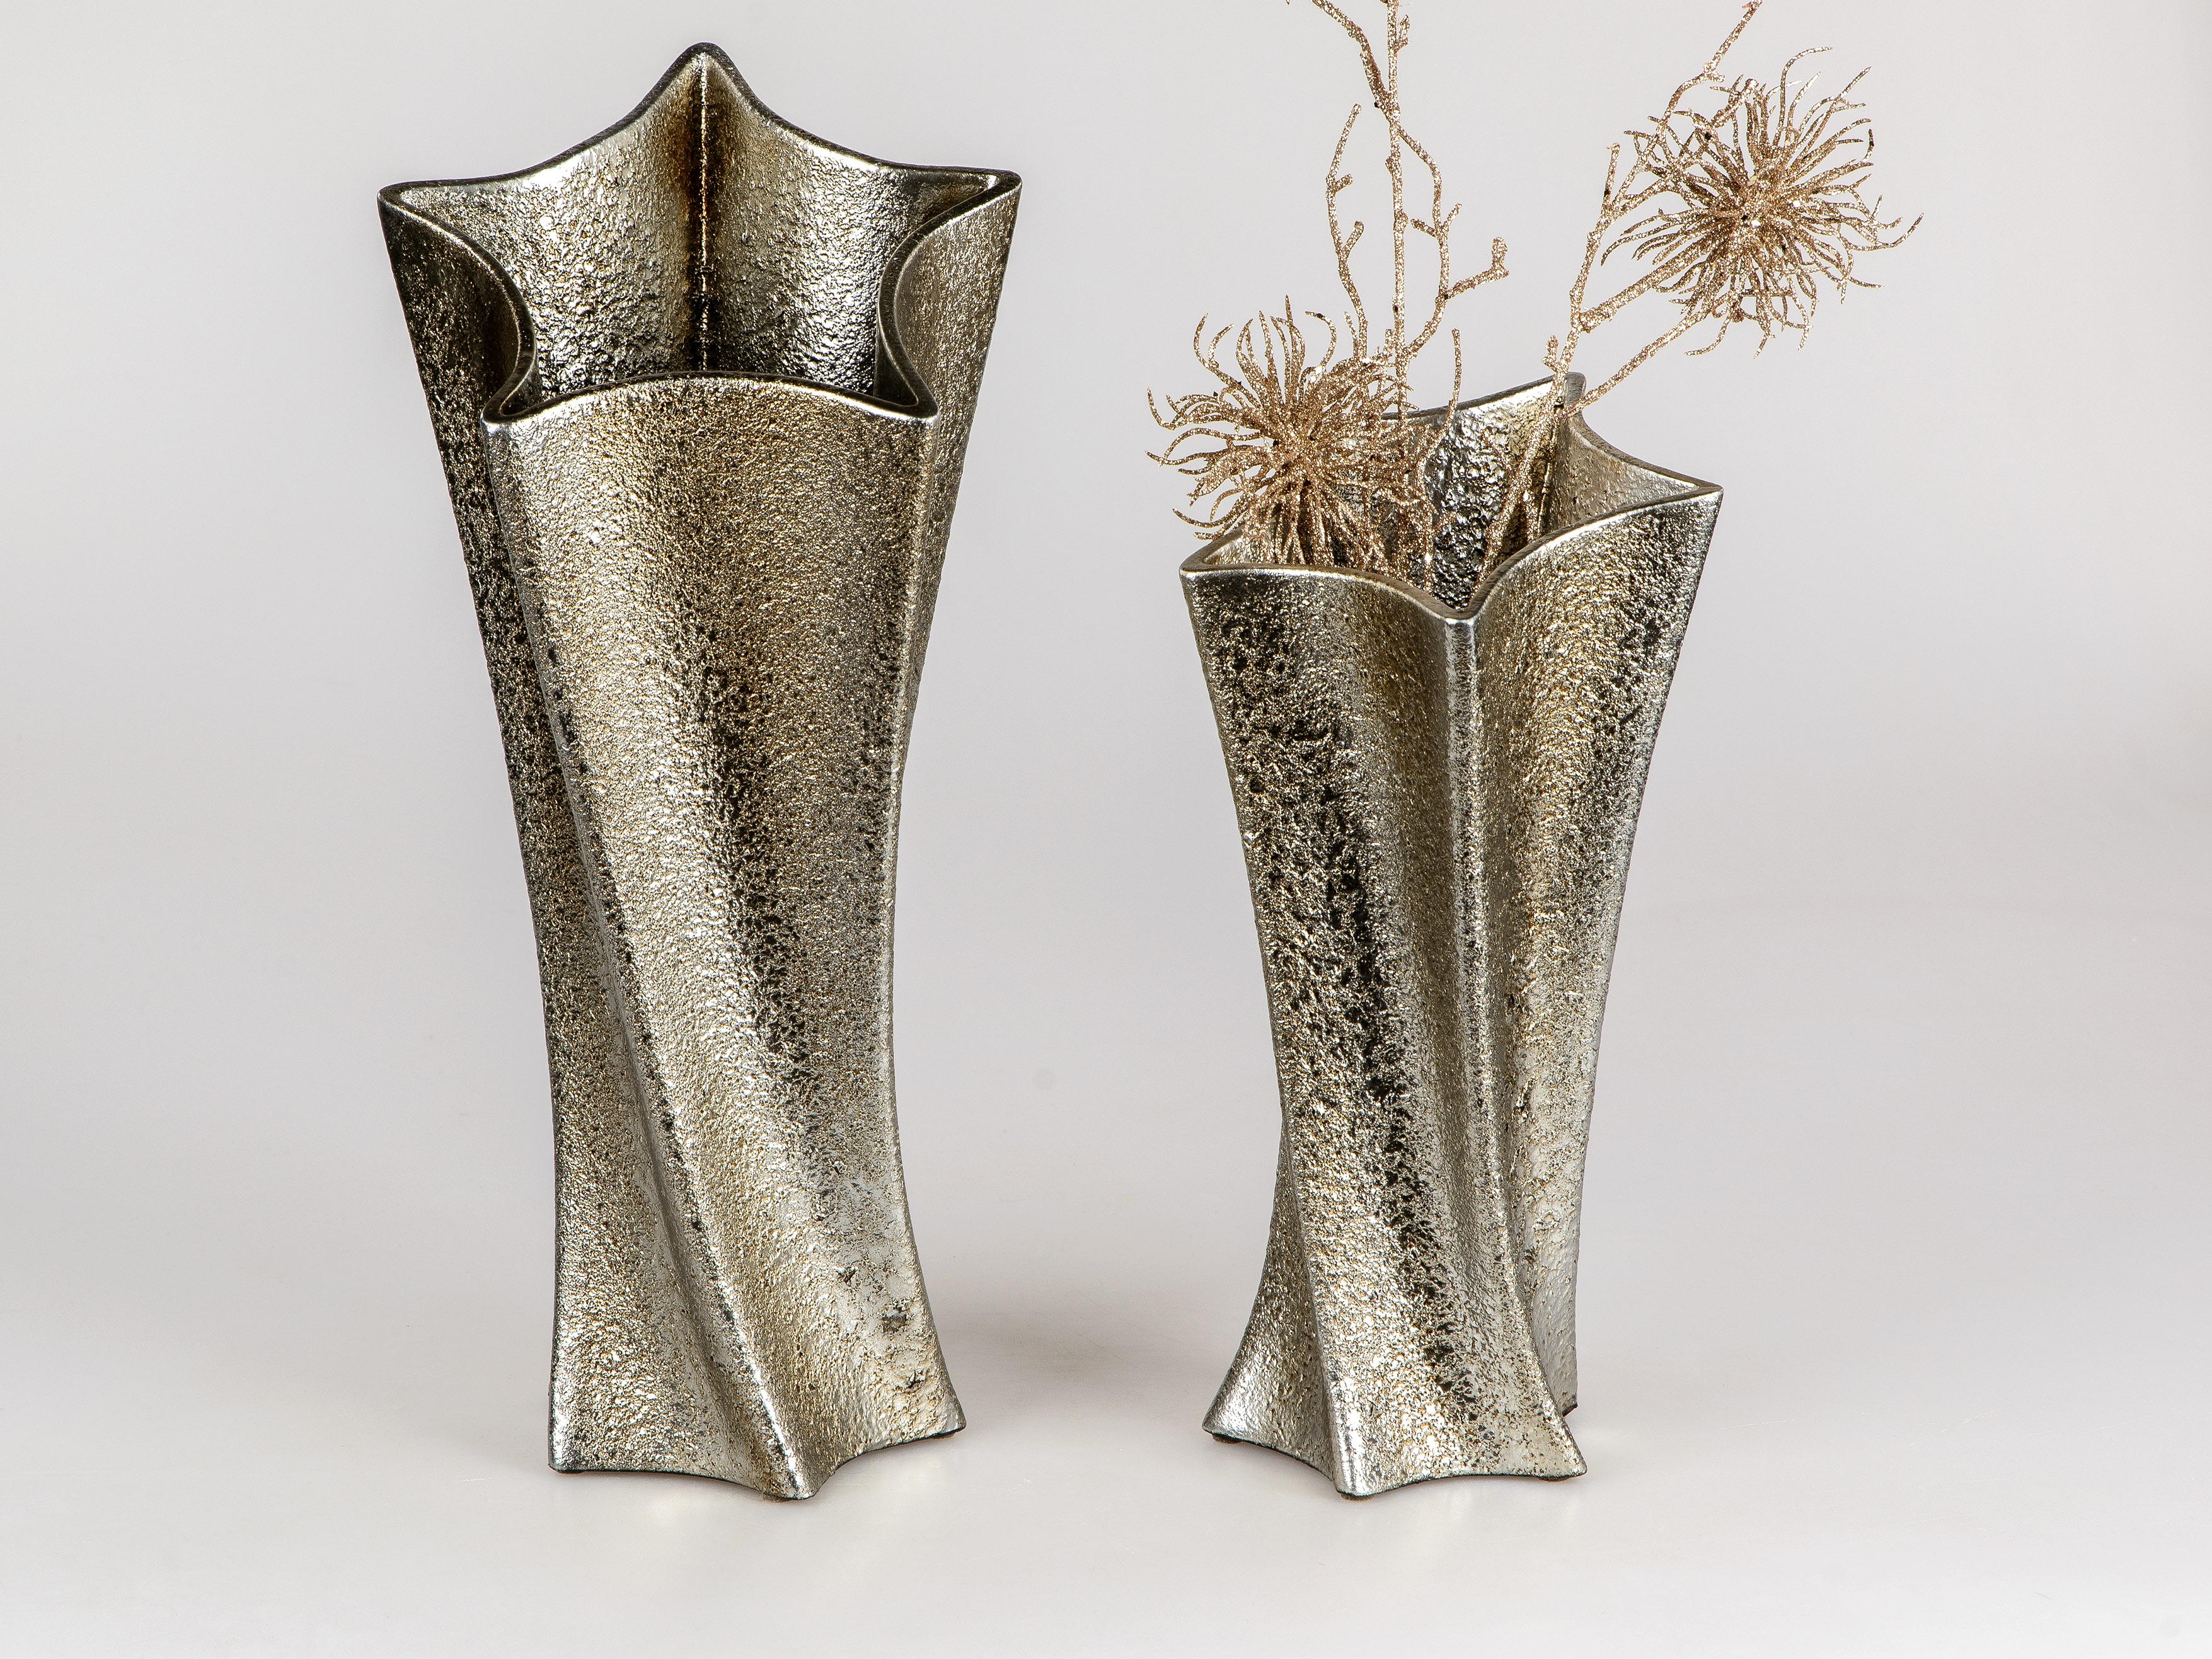 18cm H Deko Vase EDELSILBER B 17cm silber mit Strass Keramik Formano W19